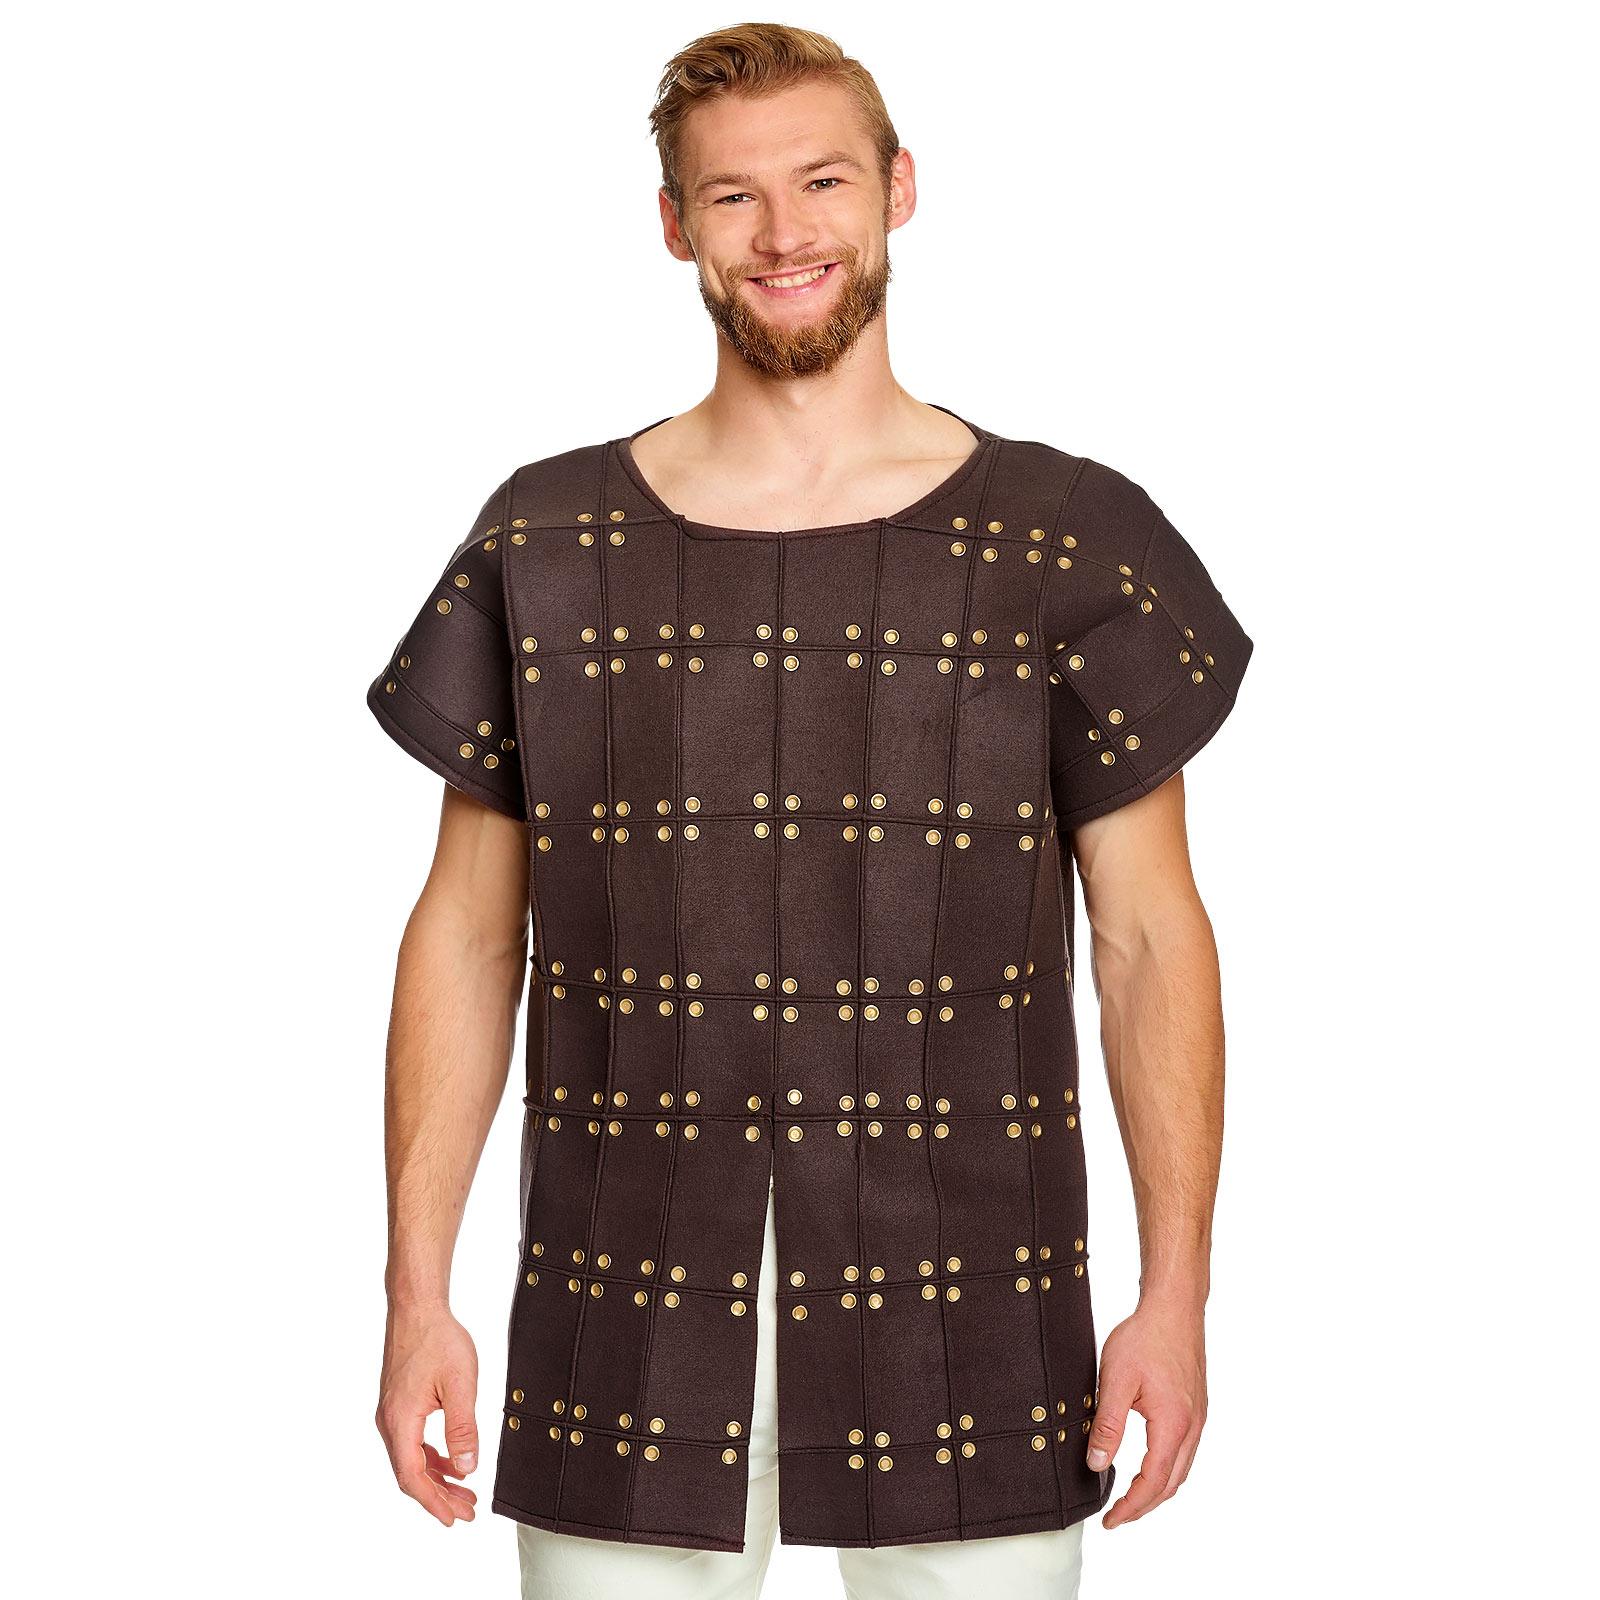 Mittelalter Kostüm Tunika Herren braun